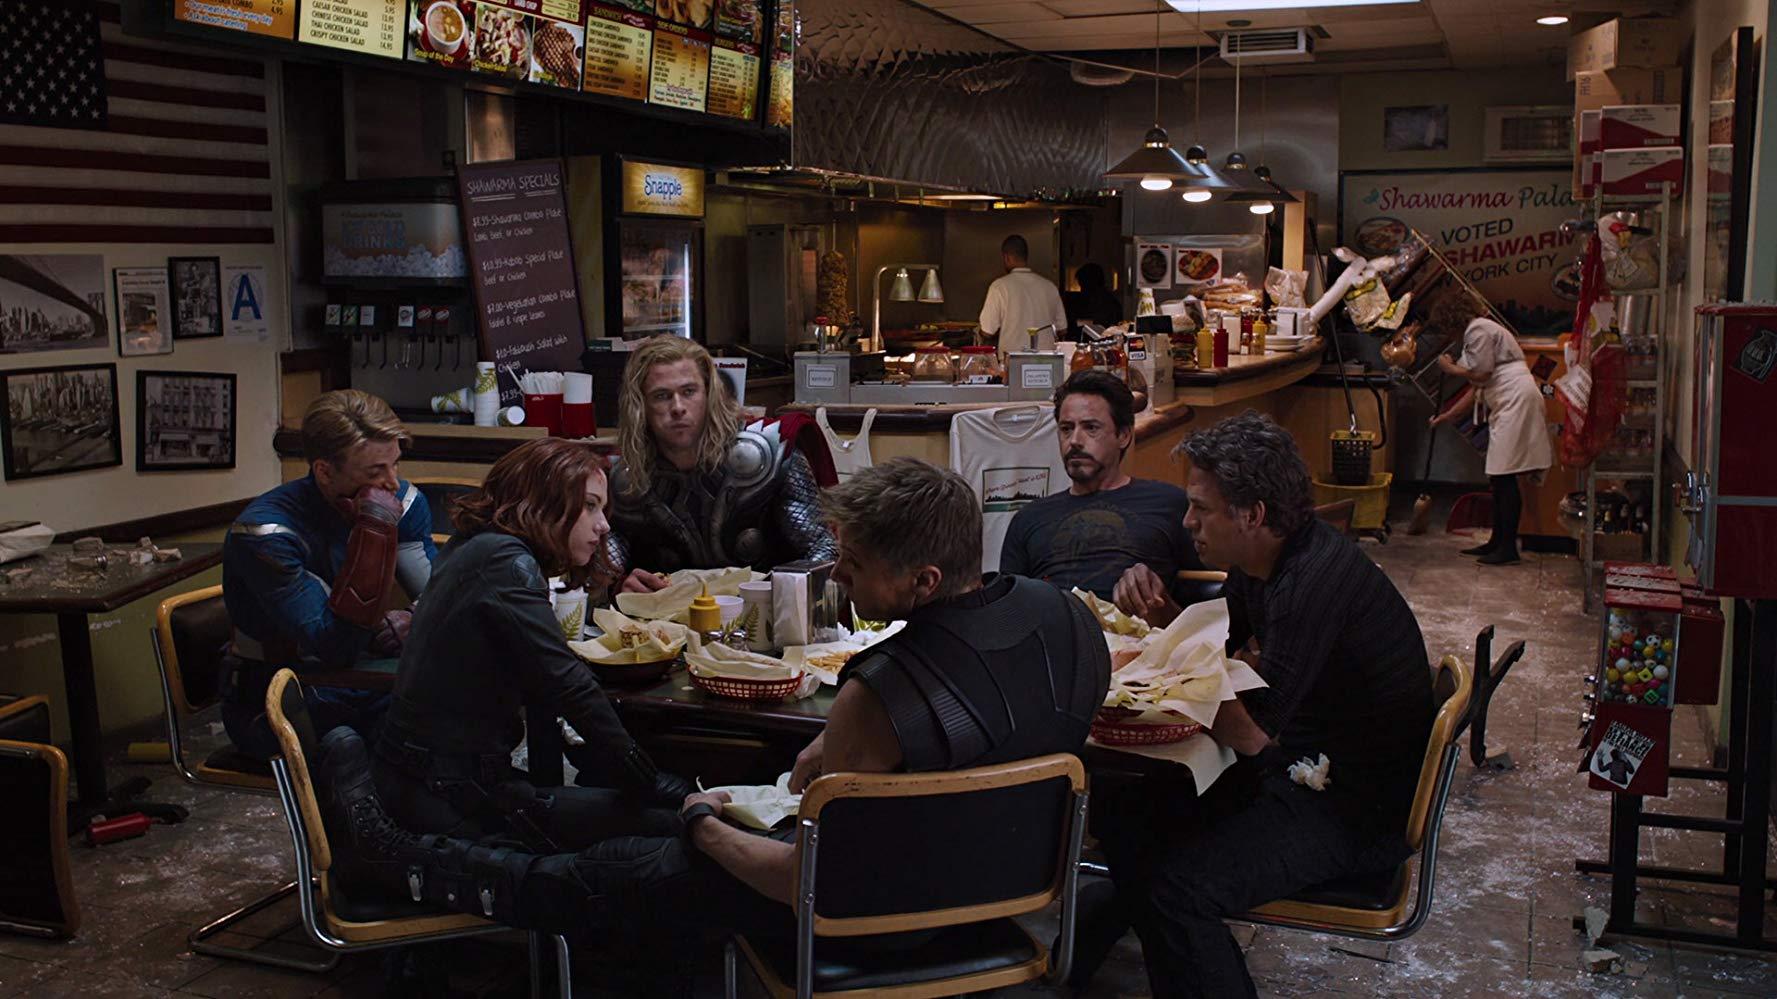 the-avengers-cast-shawarma